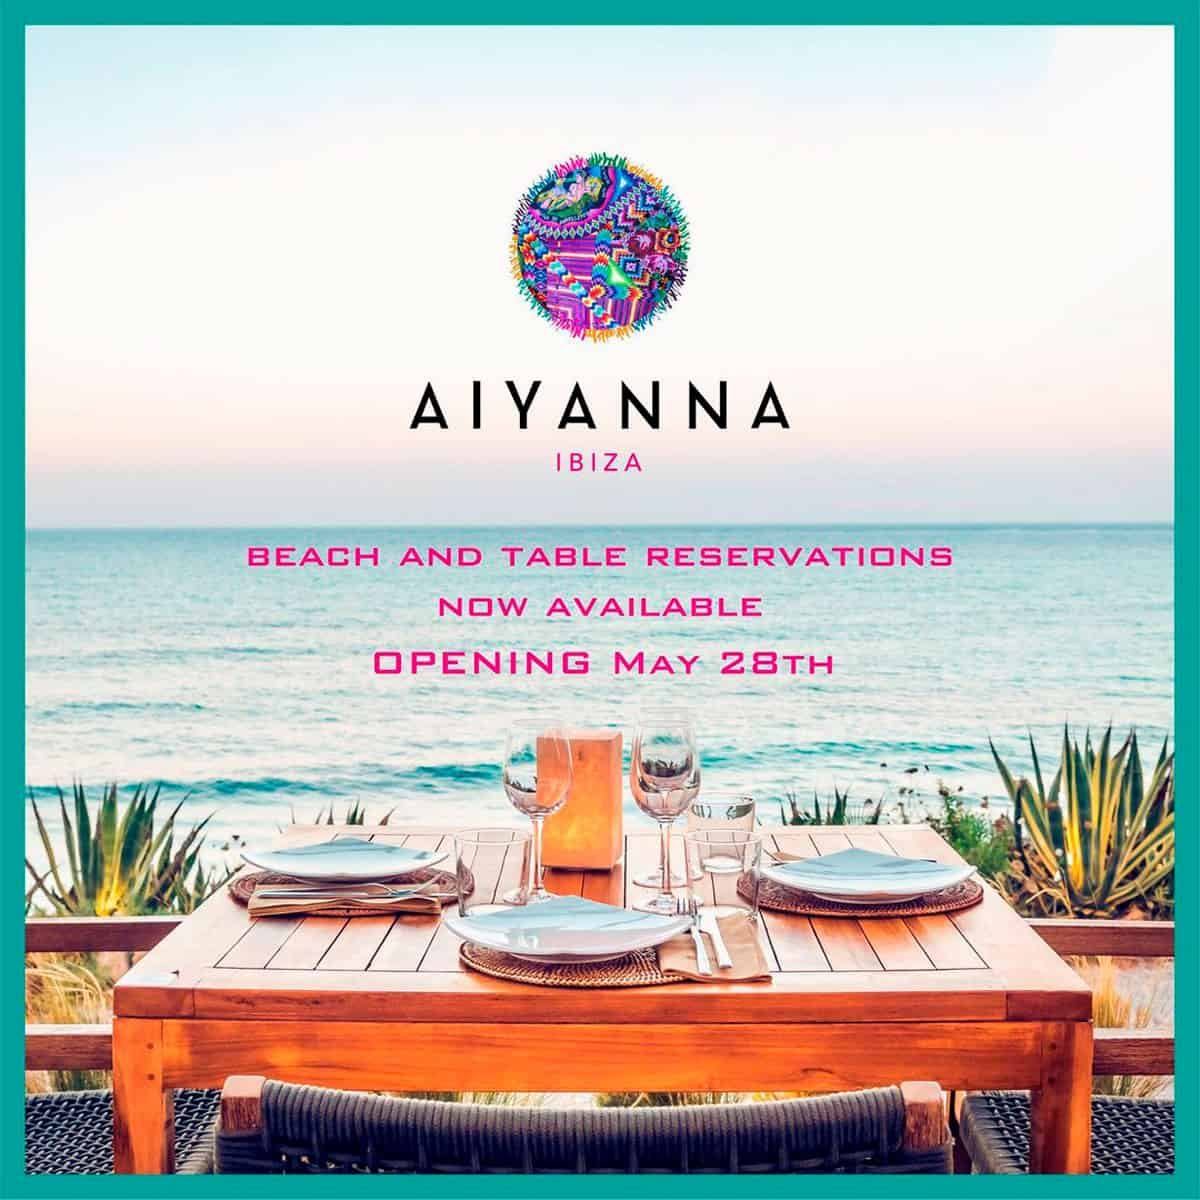 réouverture-restaurant-aiyanna-ibiza-2021-welcometoibiza